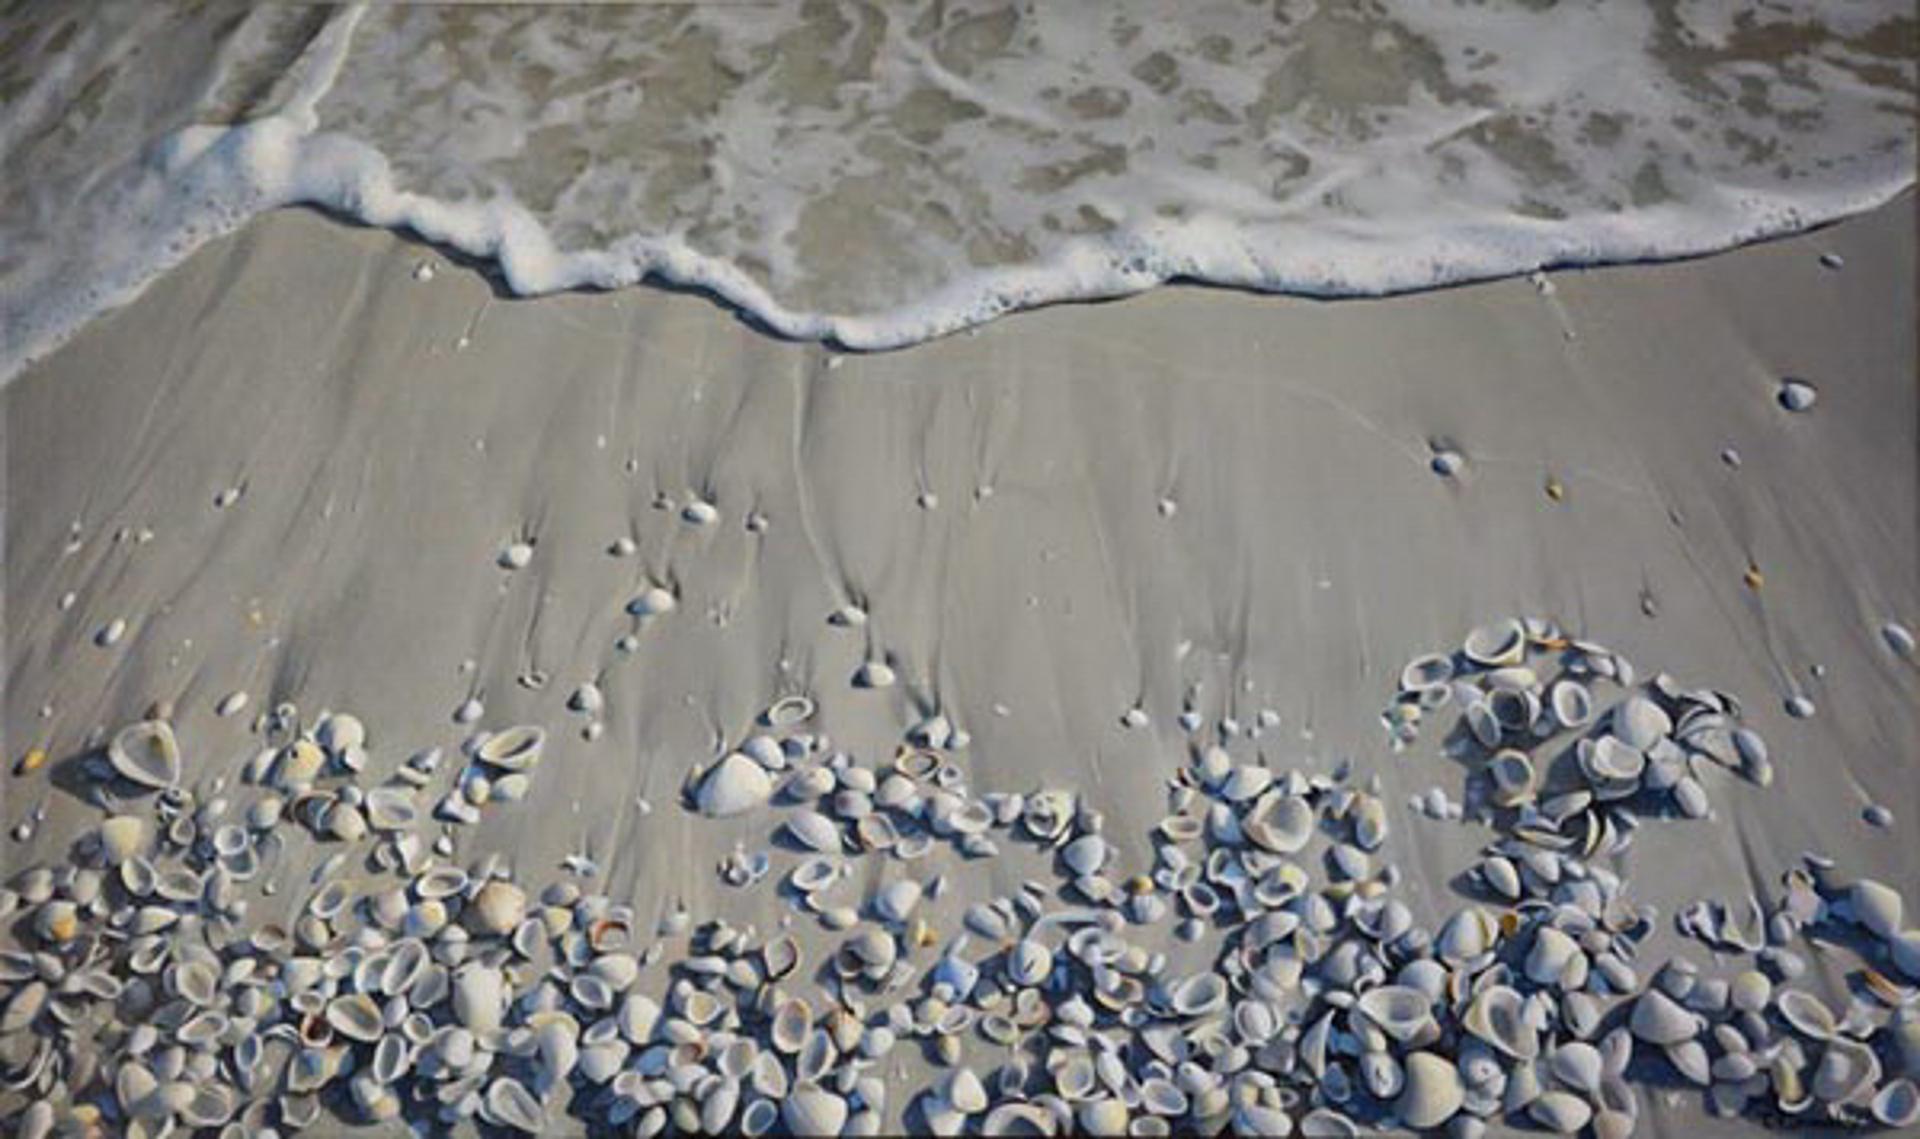 Washed Ashore by Tatyana Klevenskiy